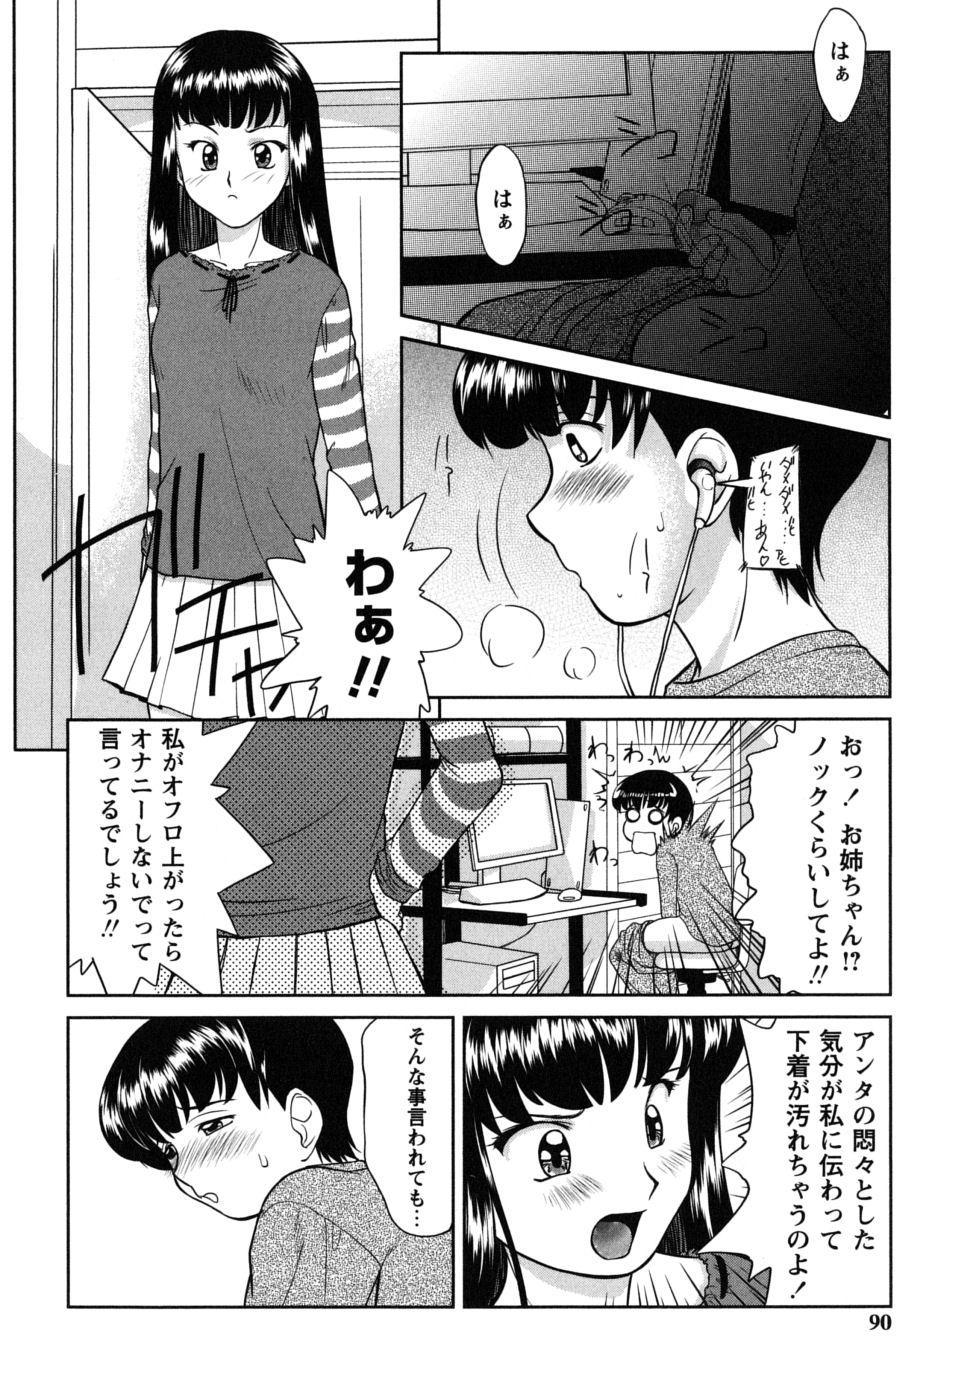 Futa Go Ecchi 89